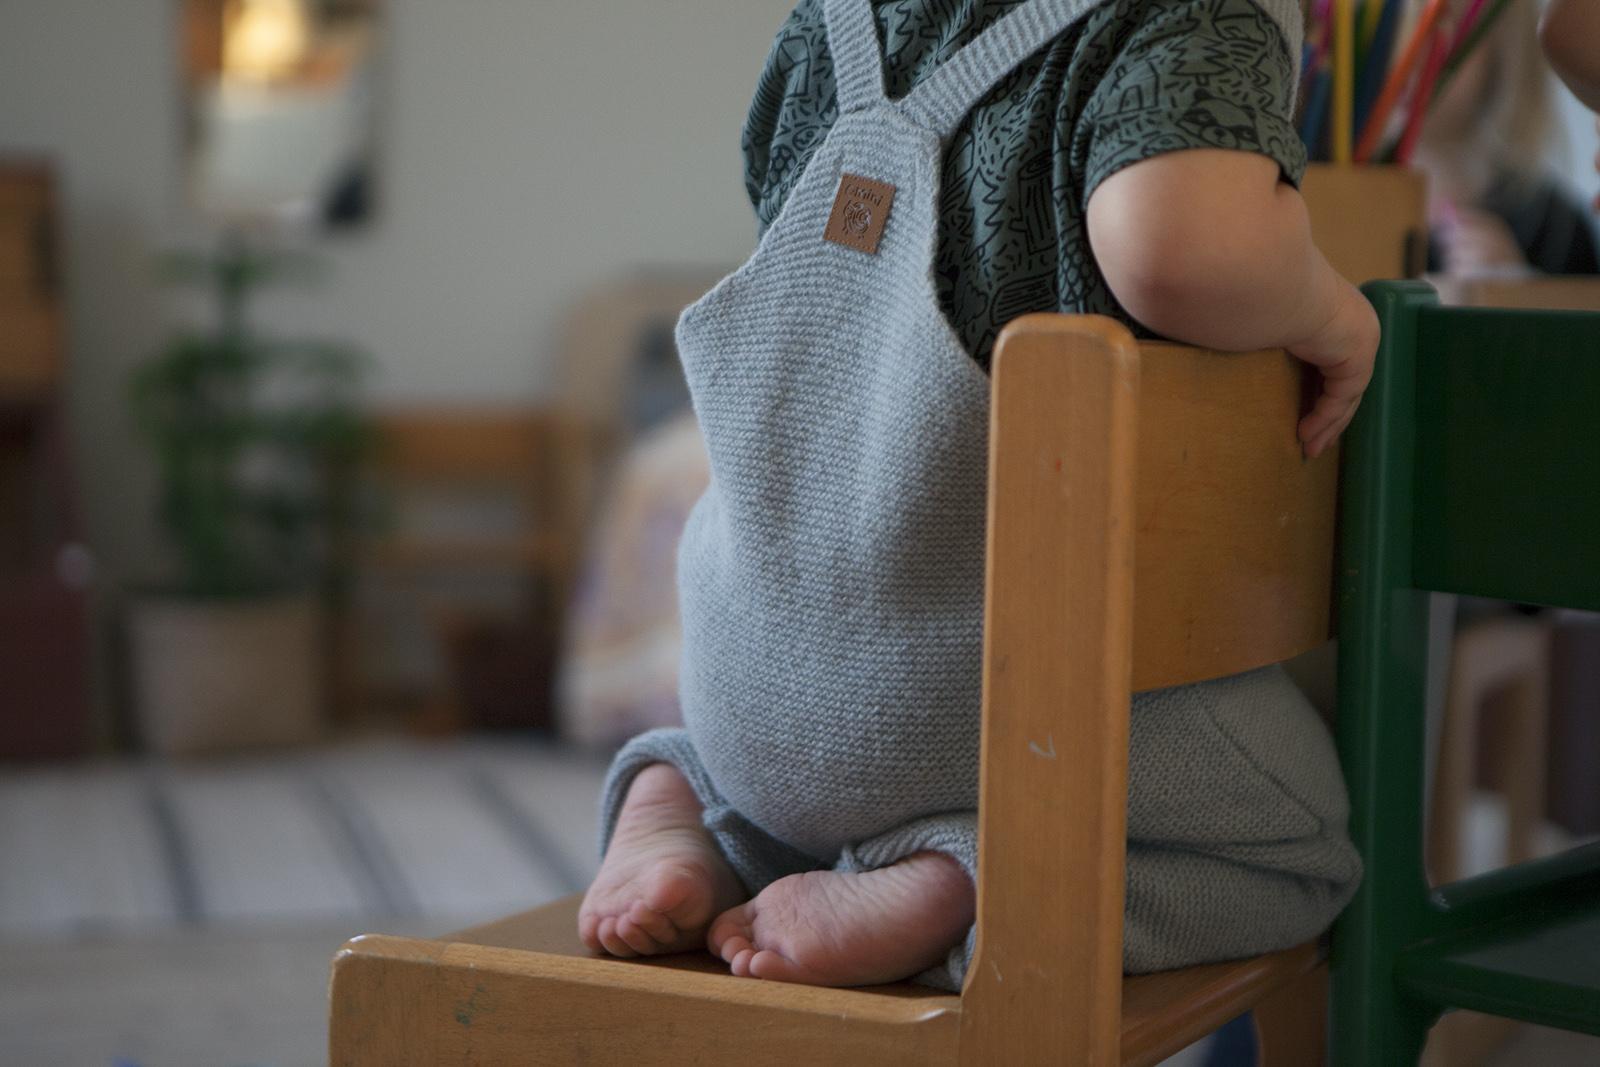 Amelie von Essen, Amelies hus, barnkläder bebiskläder snygga fina, hängselbyxor ull Cubus